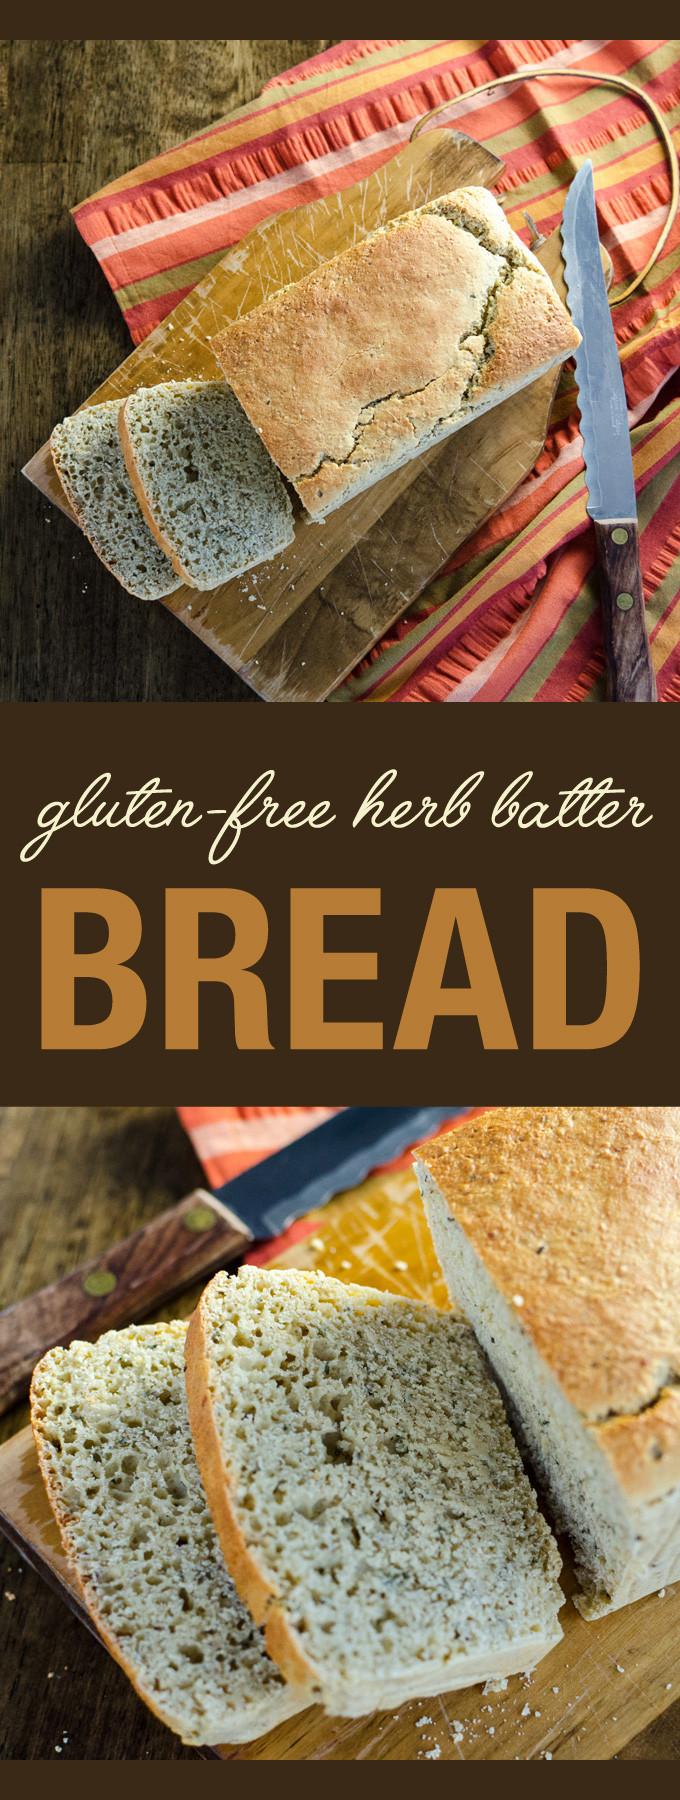 Vegan Gluten Free Bread Brands  Gluten Free Herb Batter Bread